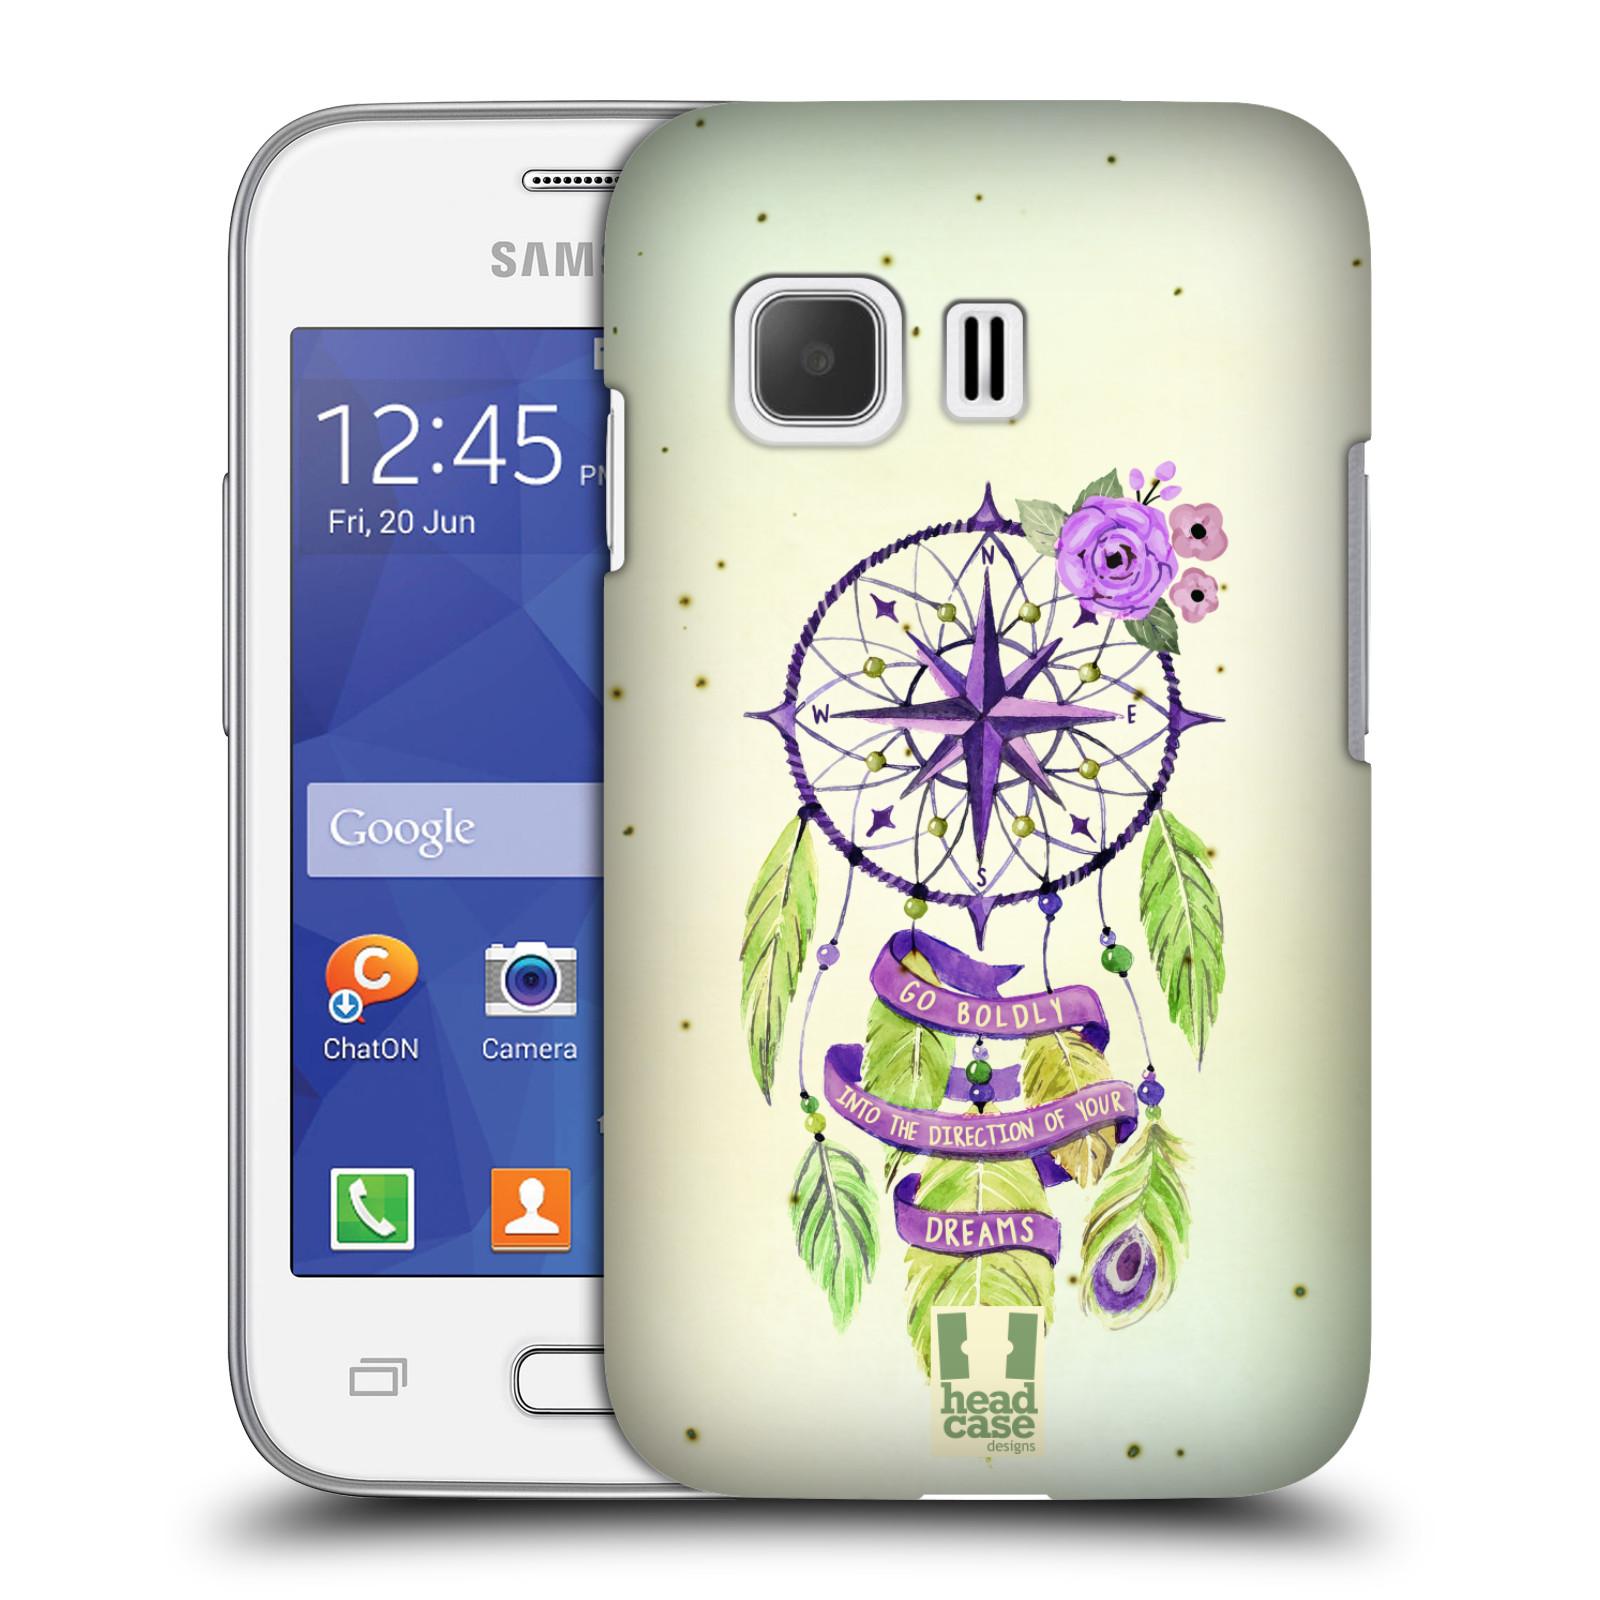 Plastové pouzdro na mobil Samsung Galaxy Young 2 HEAD CASE Lapač Assorted Compass (Kryt či obal na mobilní telefon Samsung Galaxy Young 2 SM-G130)